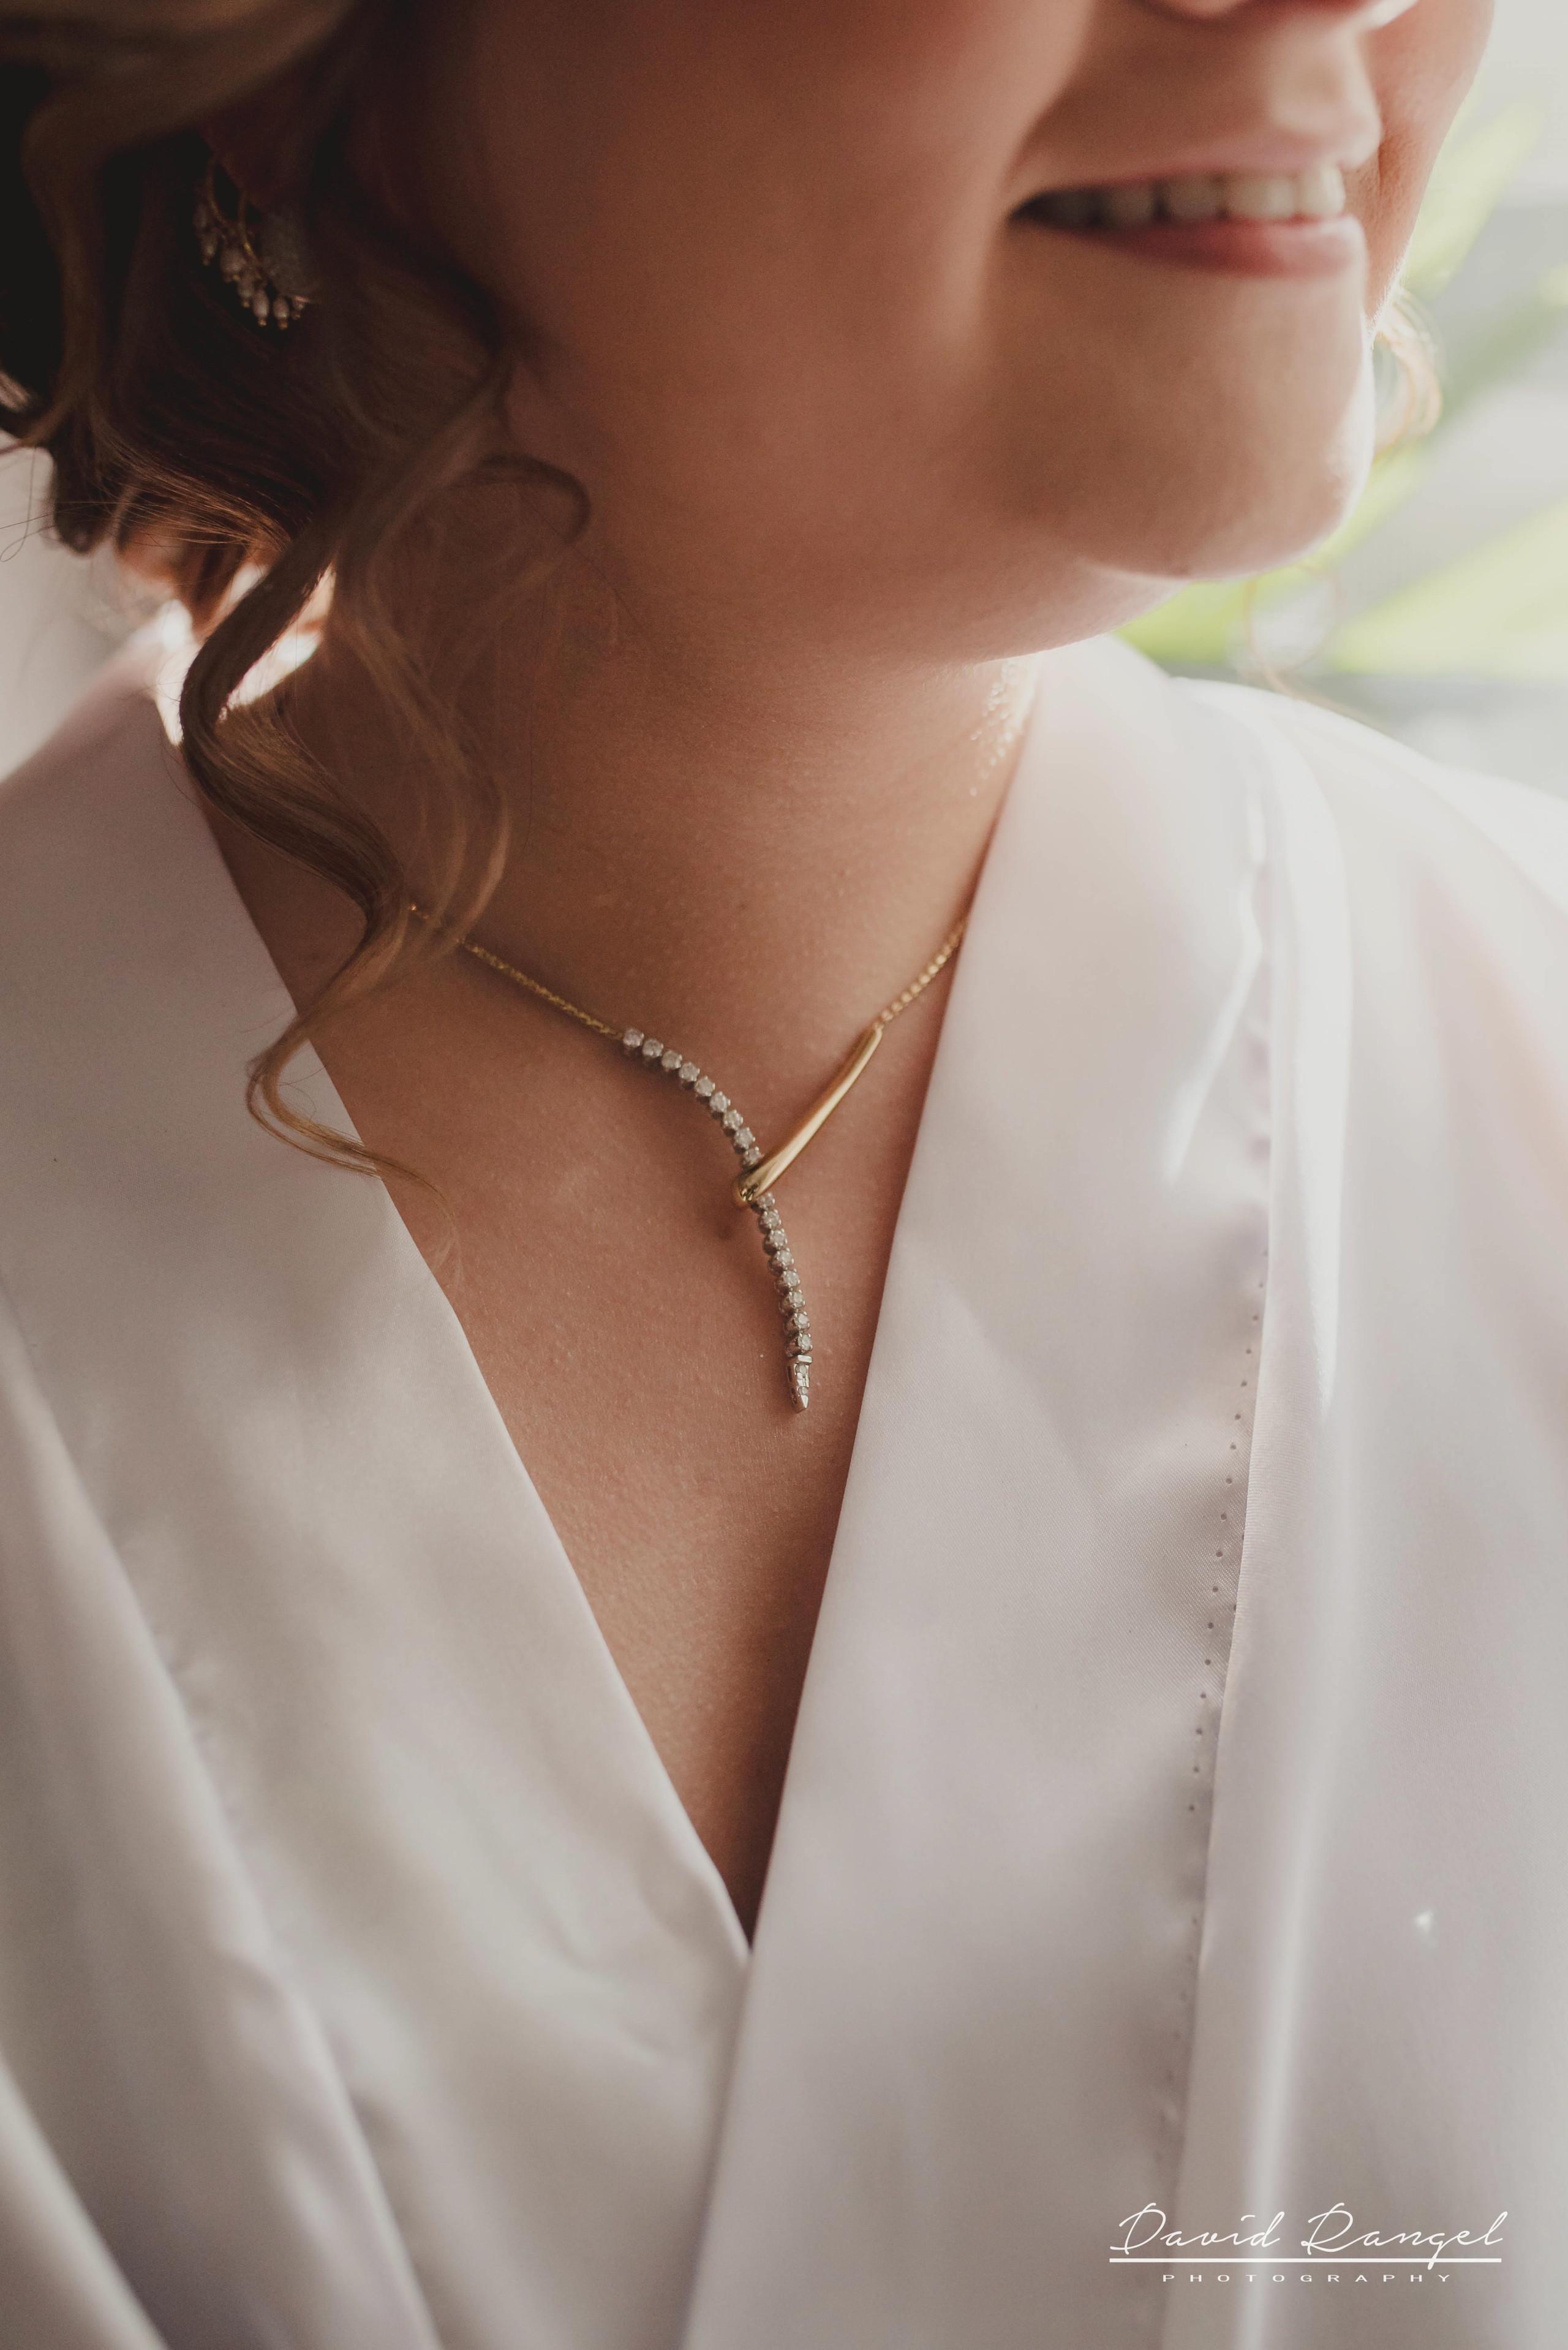 bride+getting+ready+shadow+earring++bathrobe+natural+ligh+photo+destination+wedding+isla+blanca+smile+details+jewelry